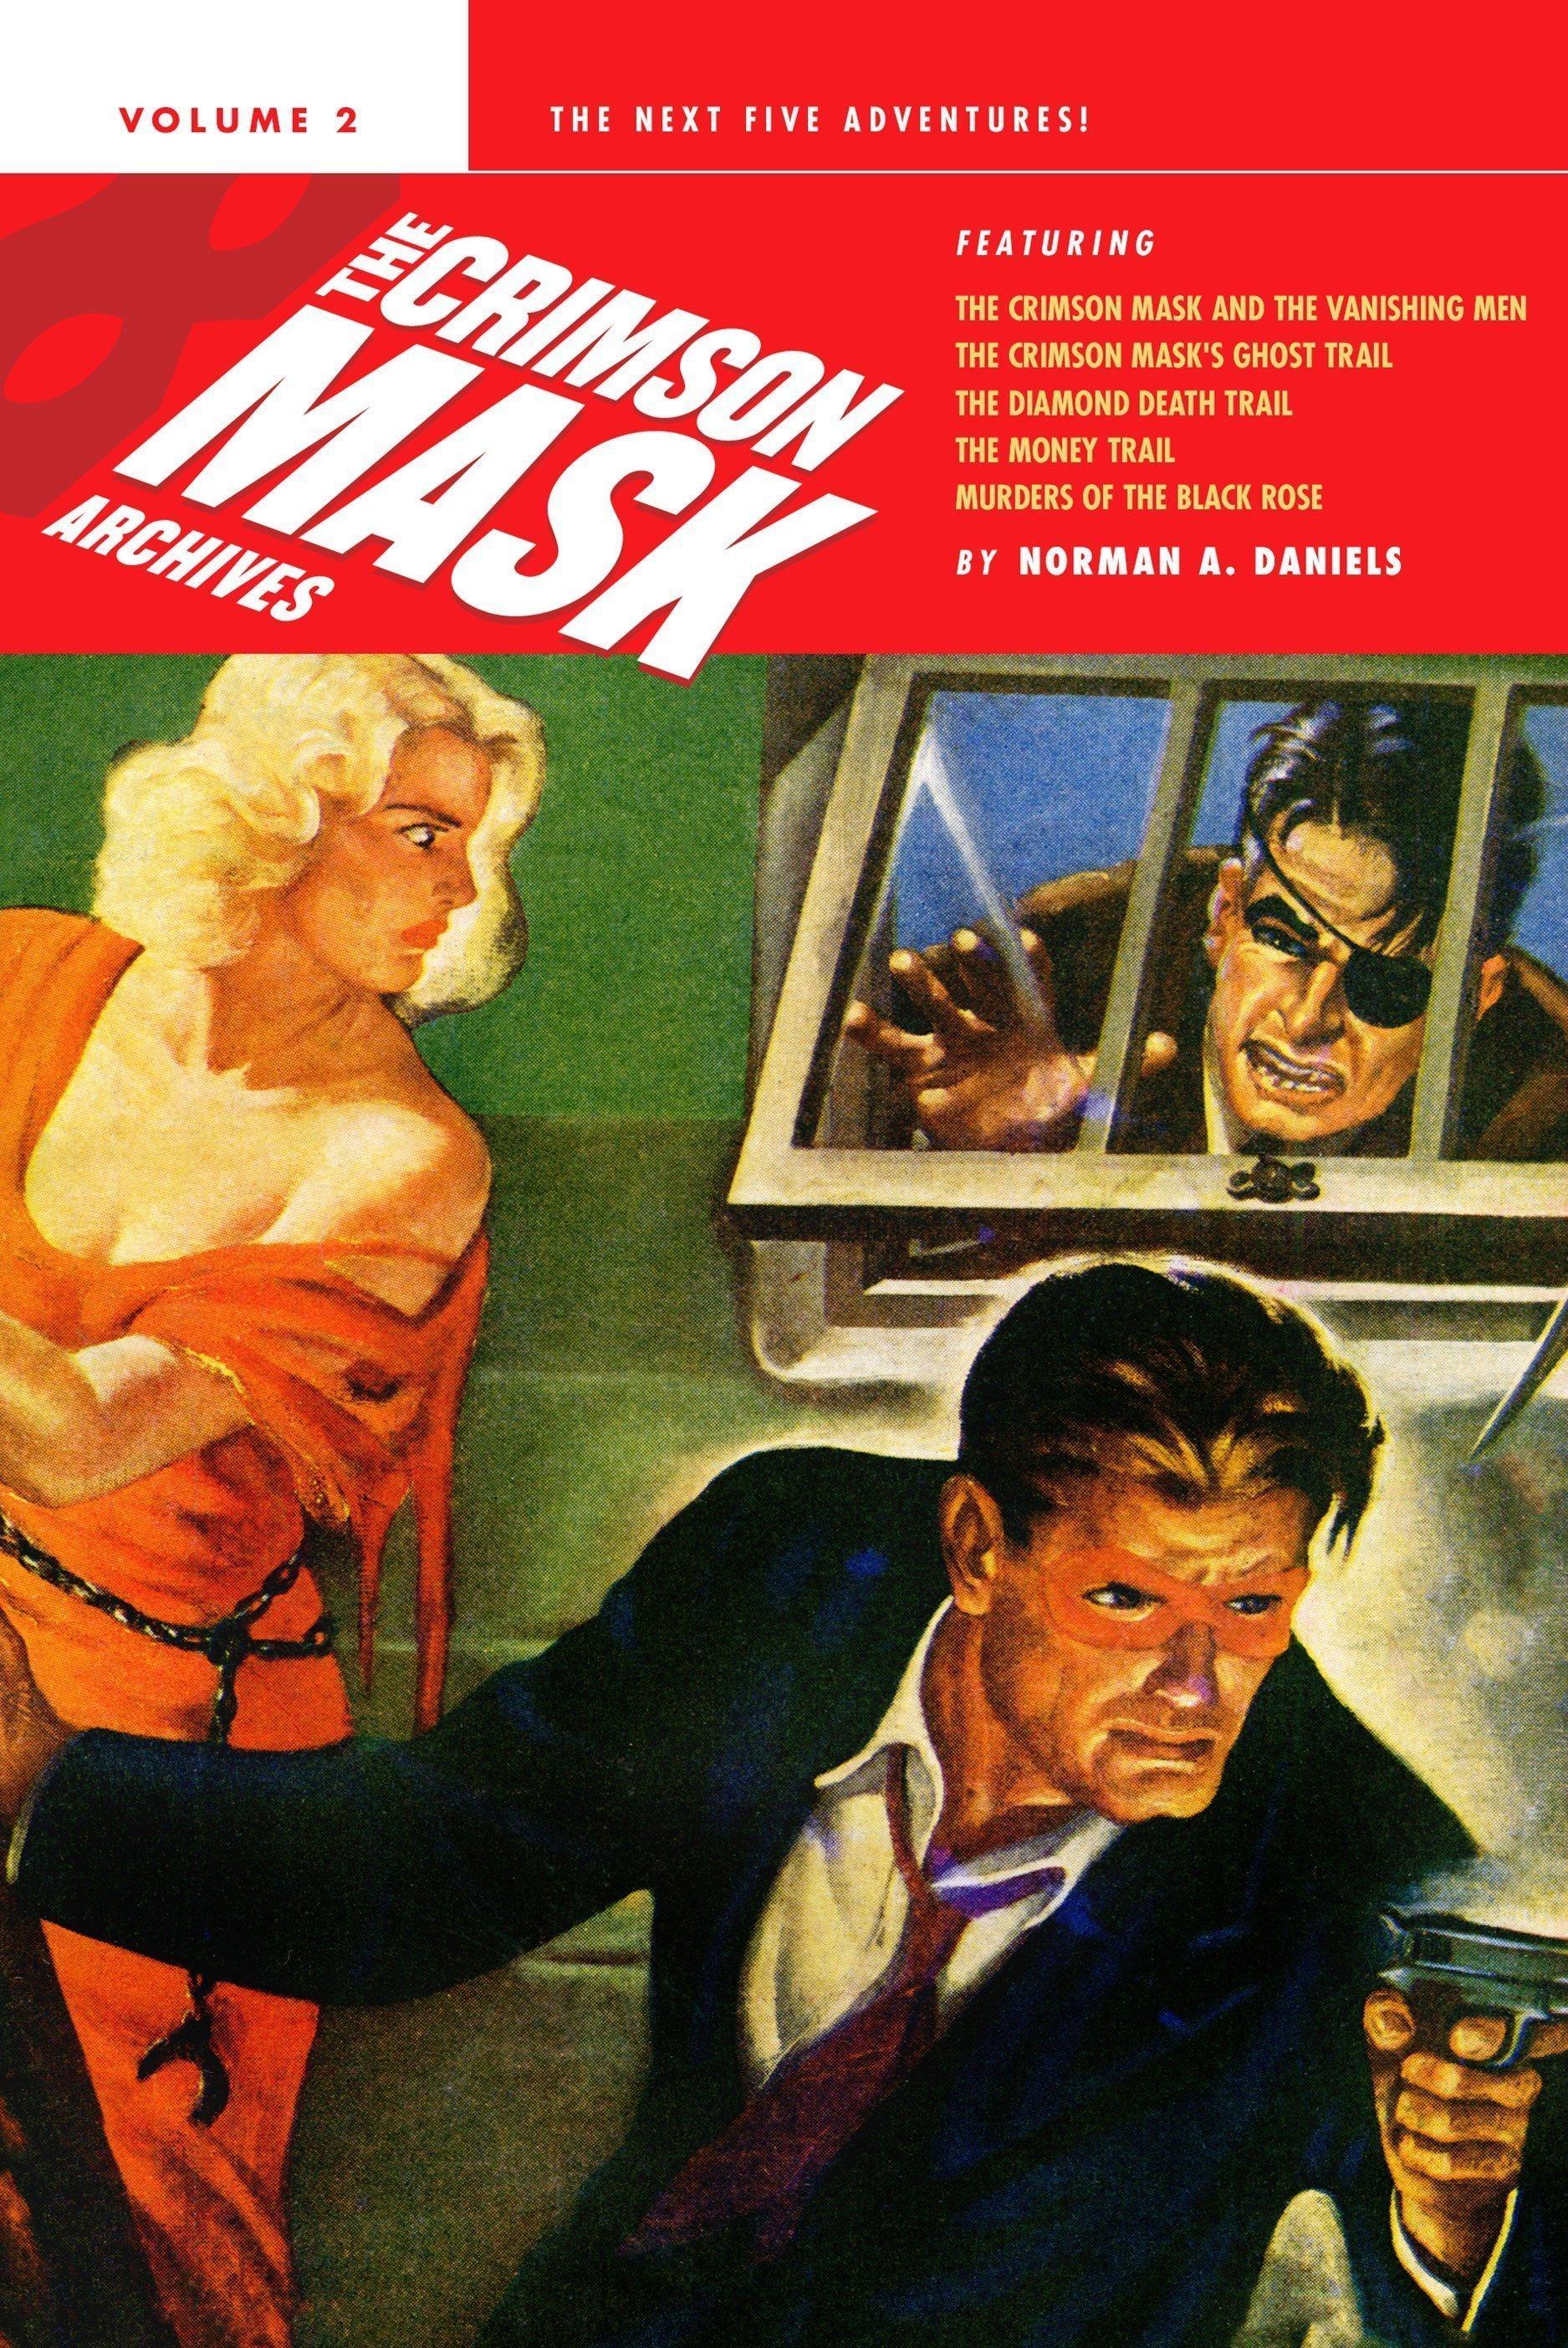 The Crimson Mask Archives, Volume 2